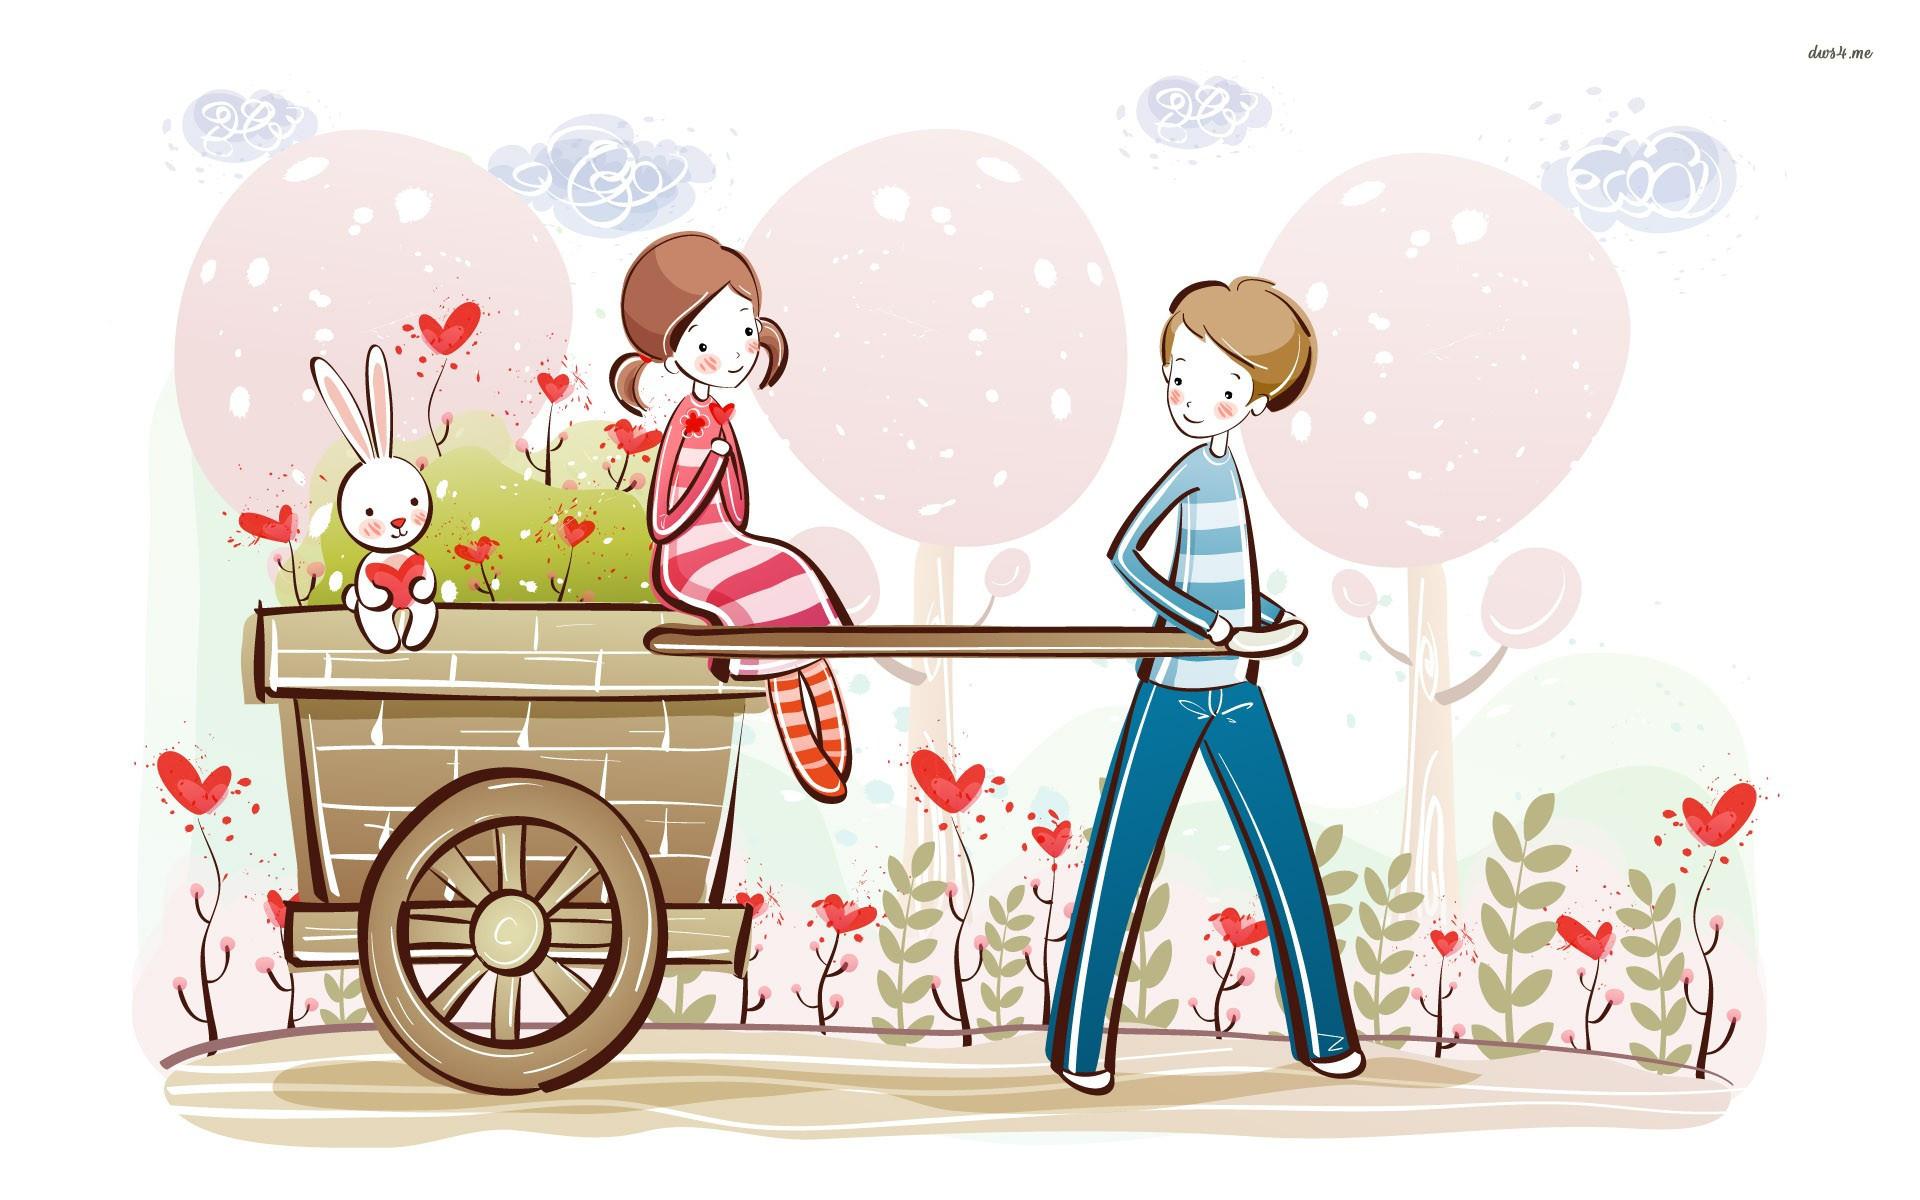 Love couple wallpaper – Digital Art wallpapers – #5435